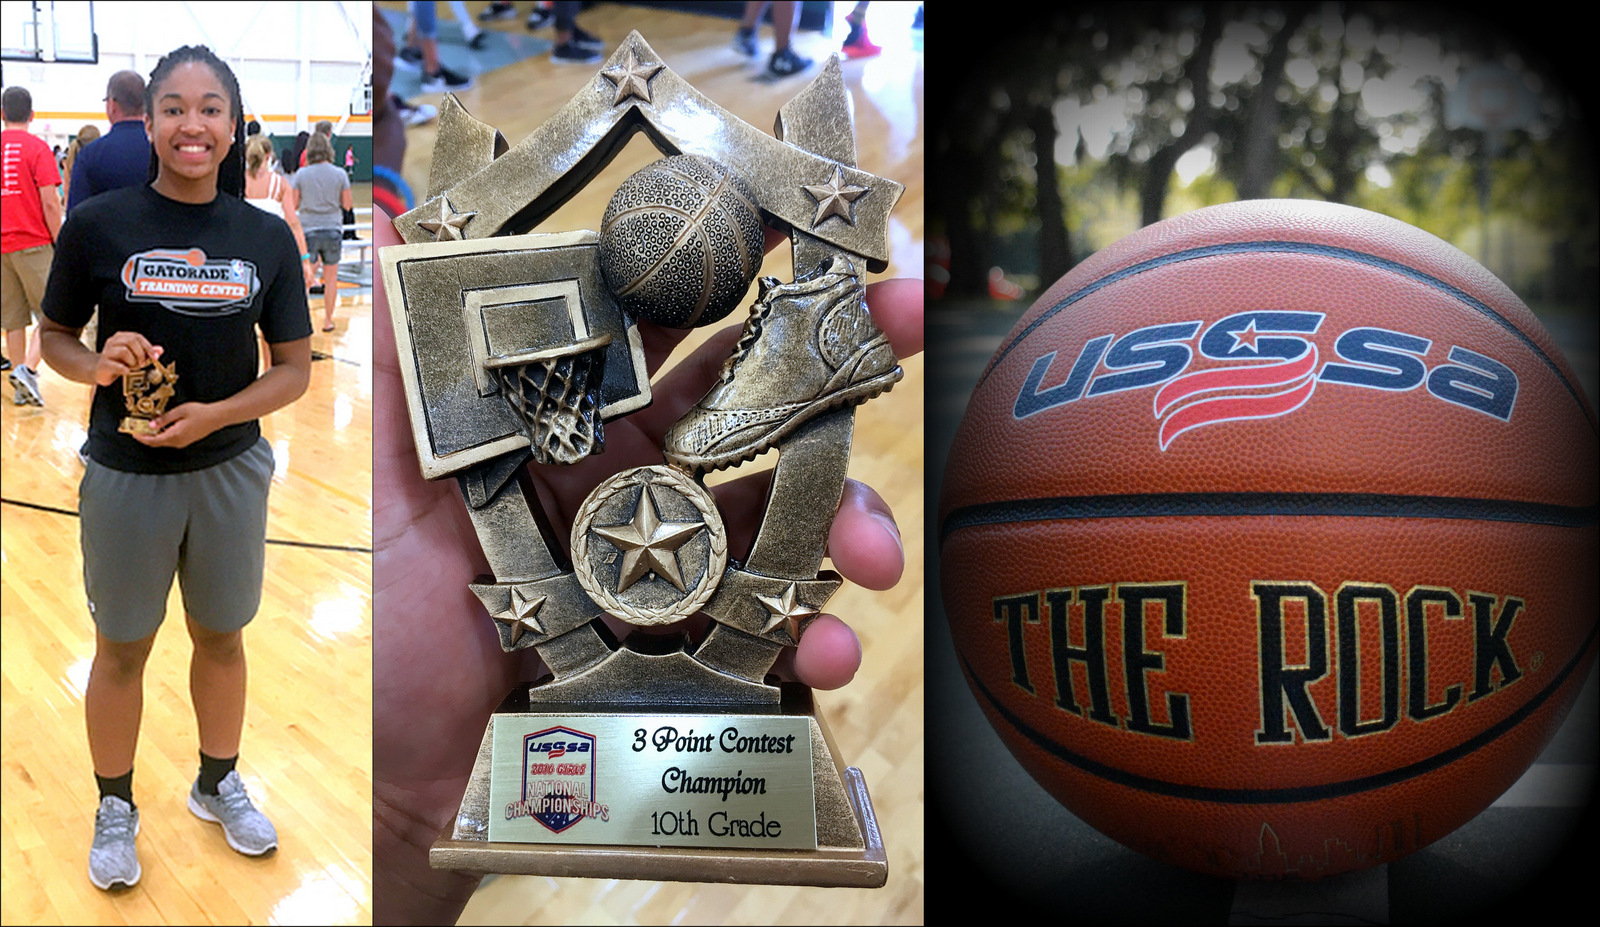 3 Pt. Champion: USSSA Nationals